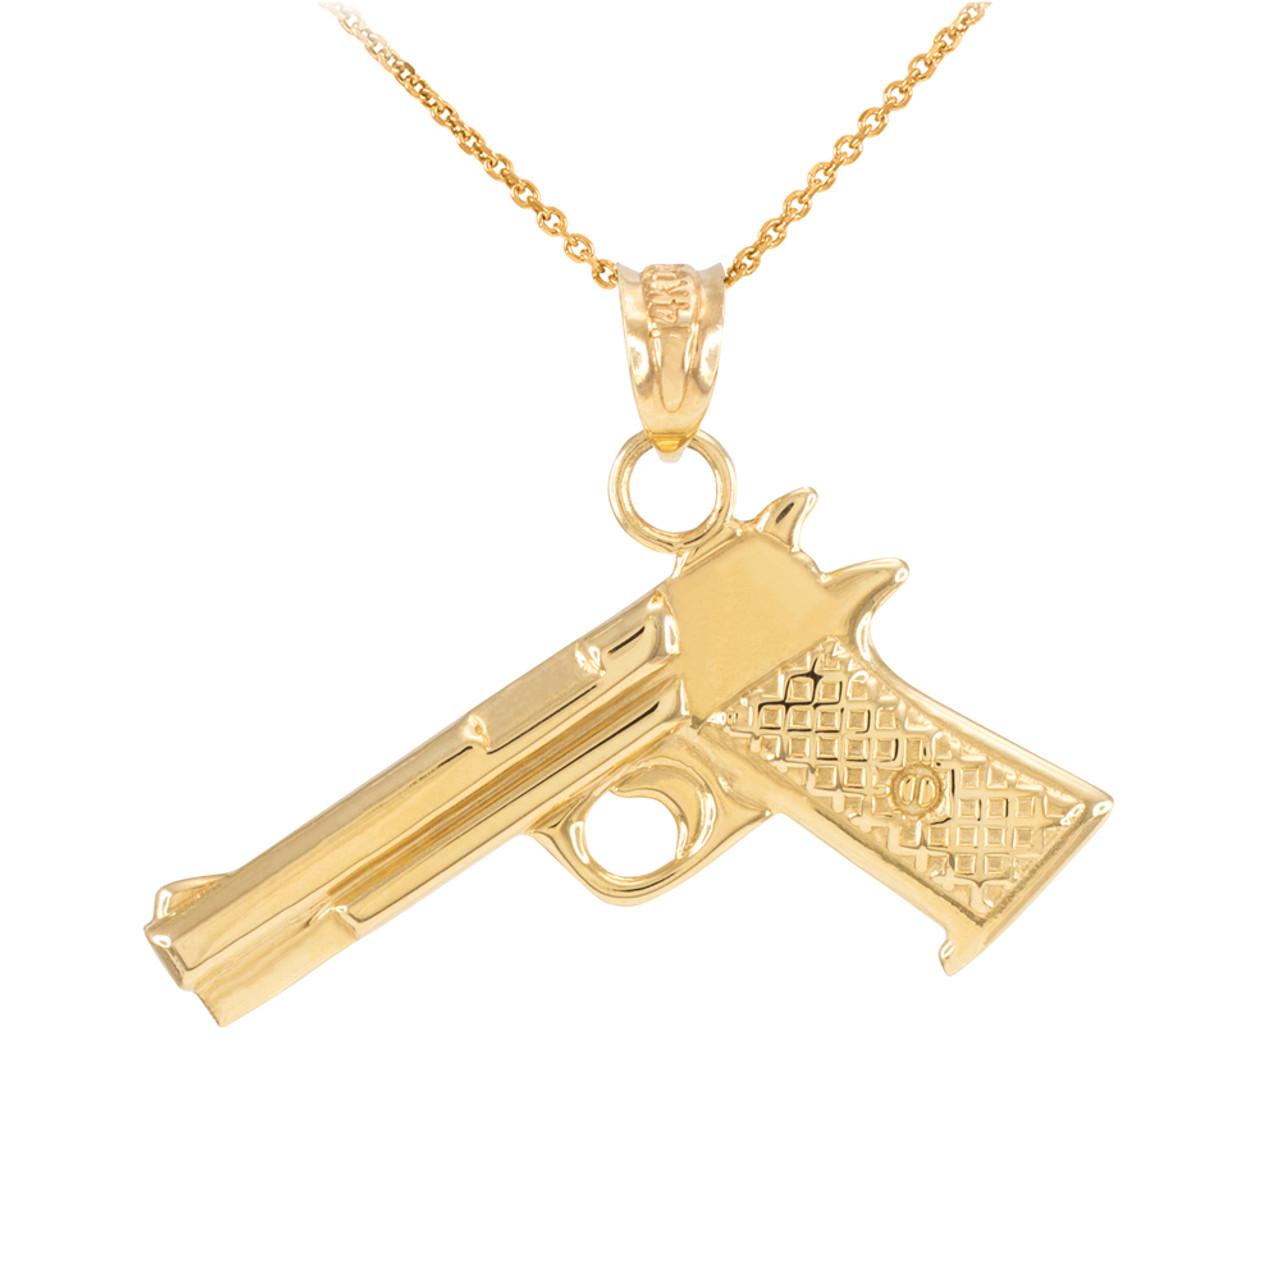 solid yellow gold desert eagle pistol gun pendant necklace